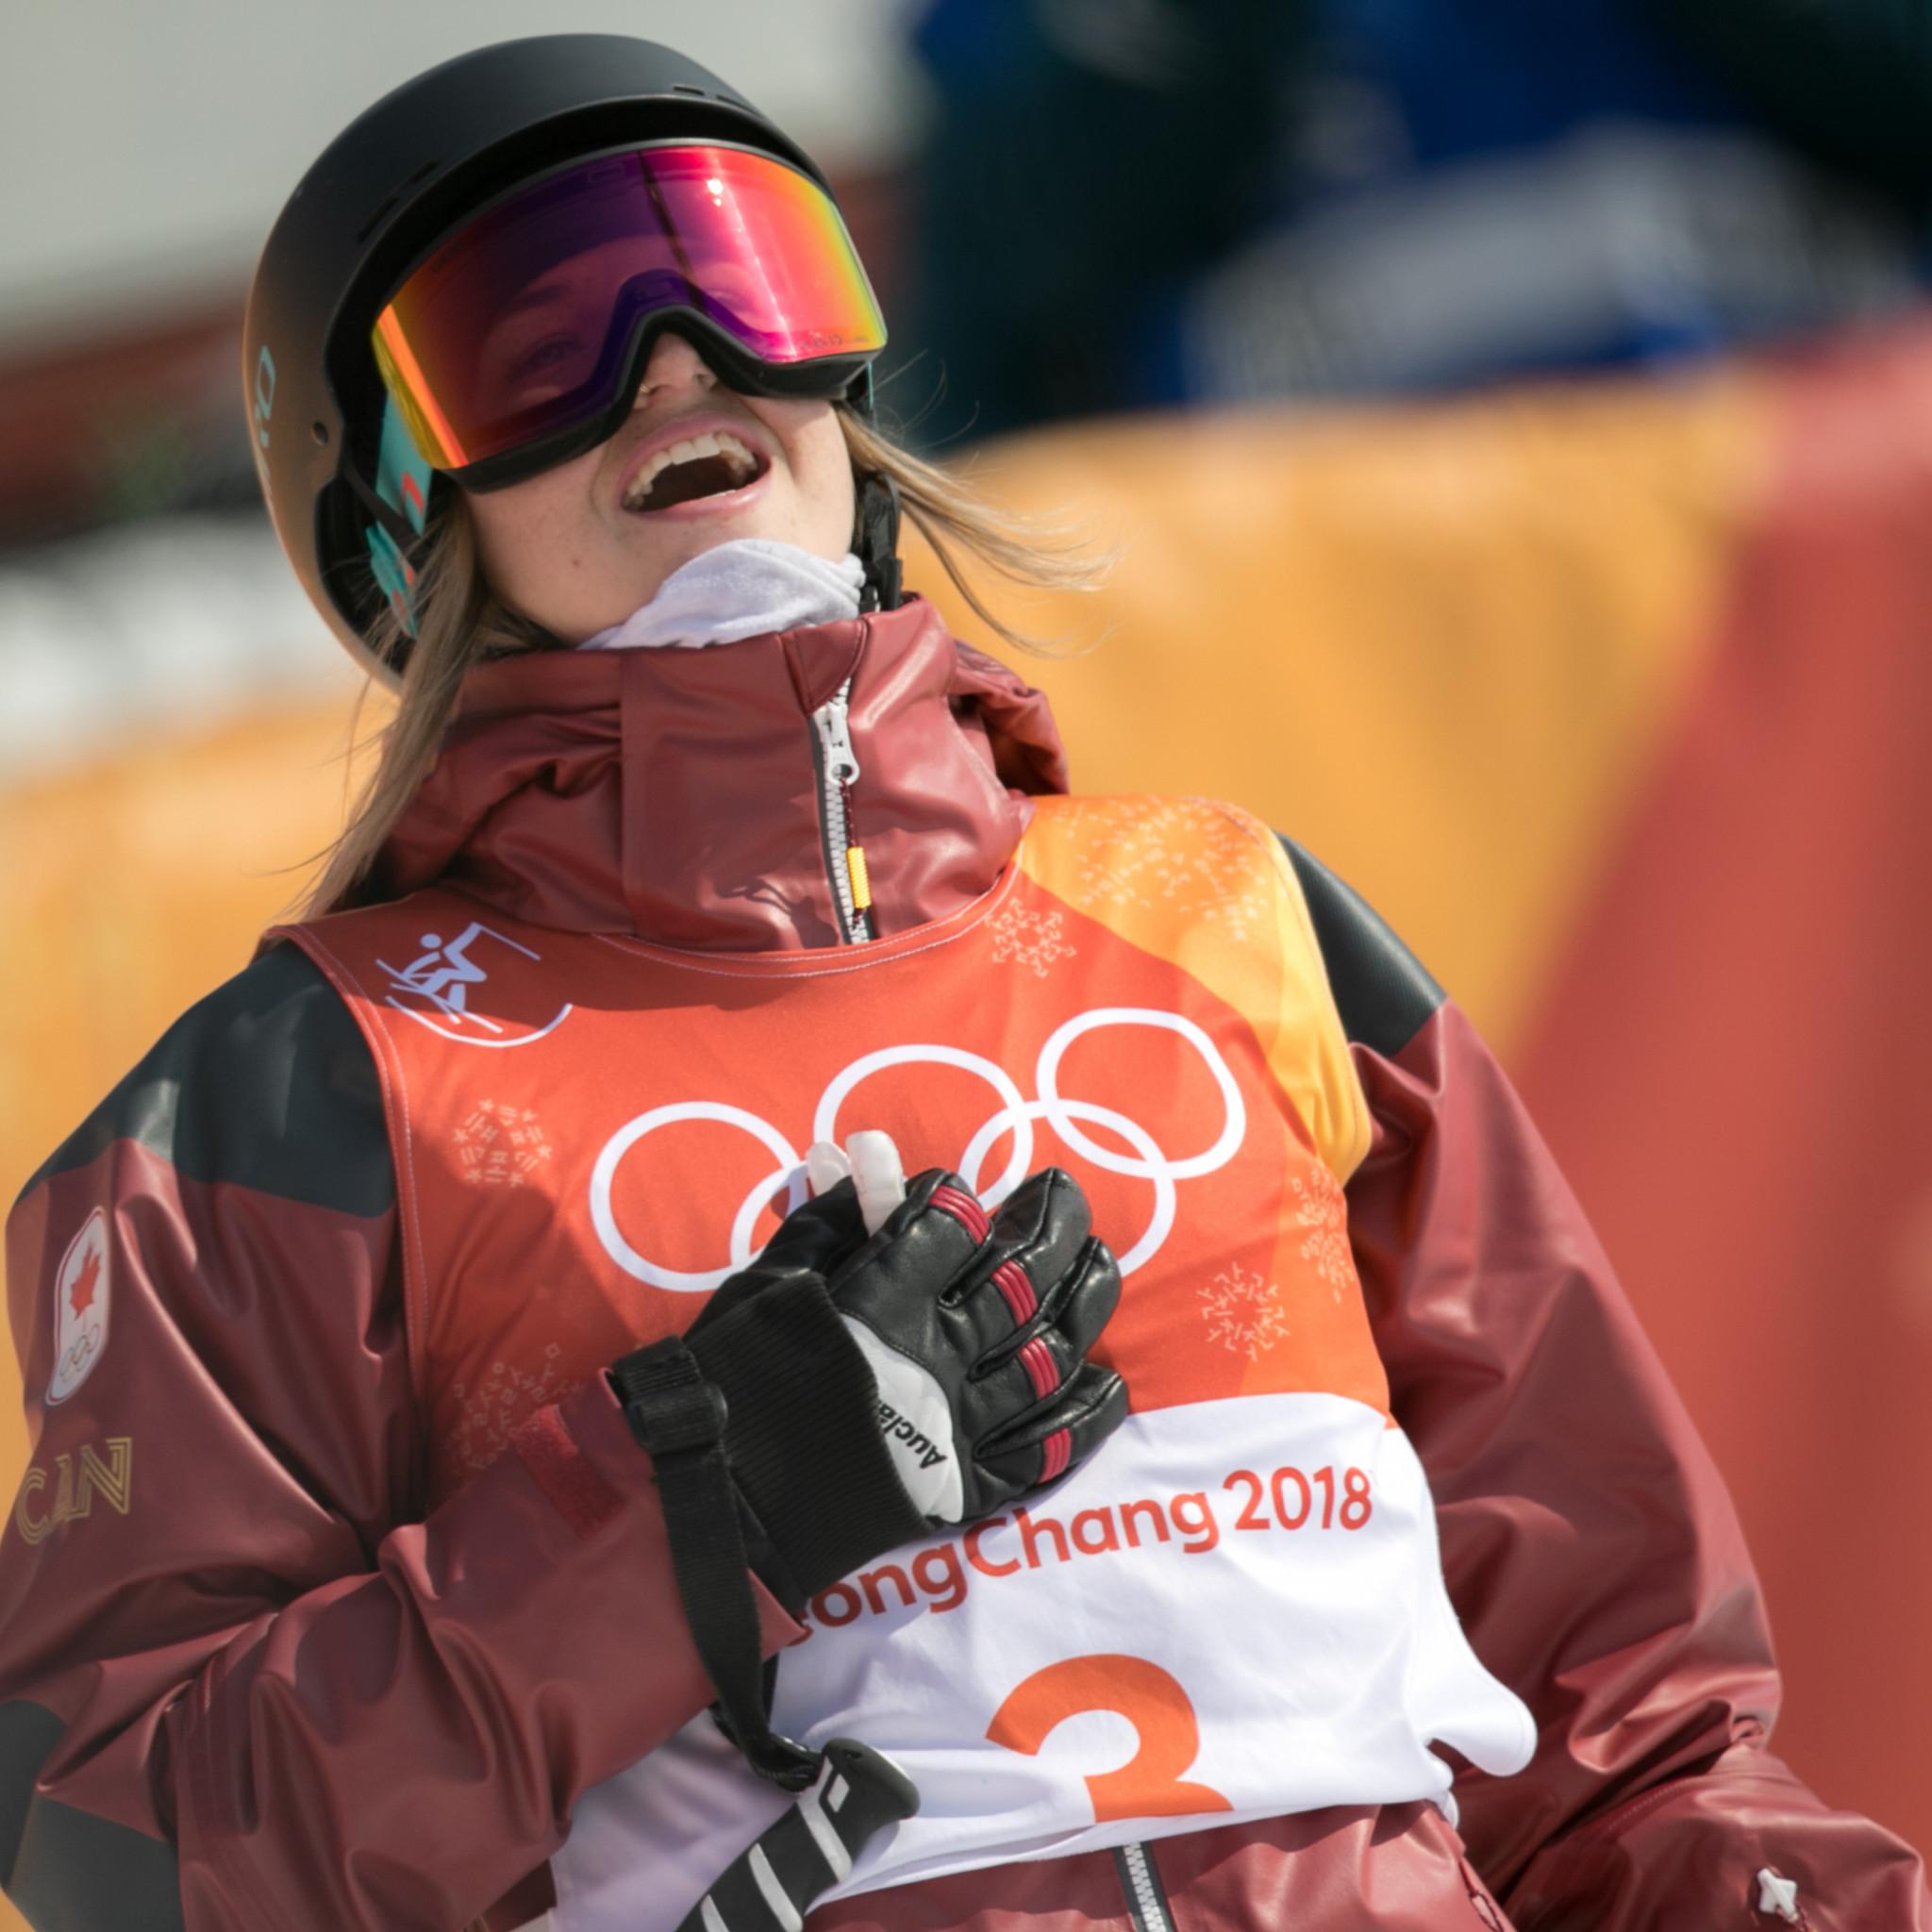 Cassie Sharpe was the best women's qualifier before tomorrow's finals ©Getty Images